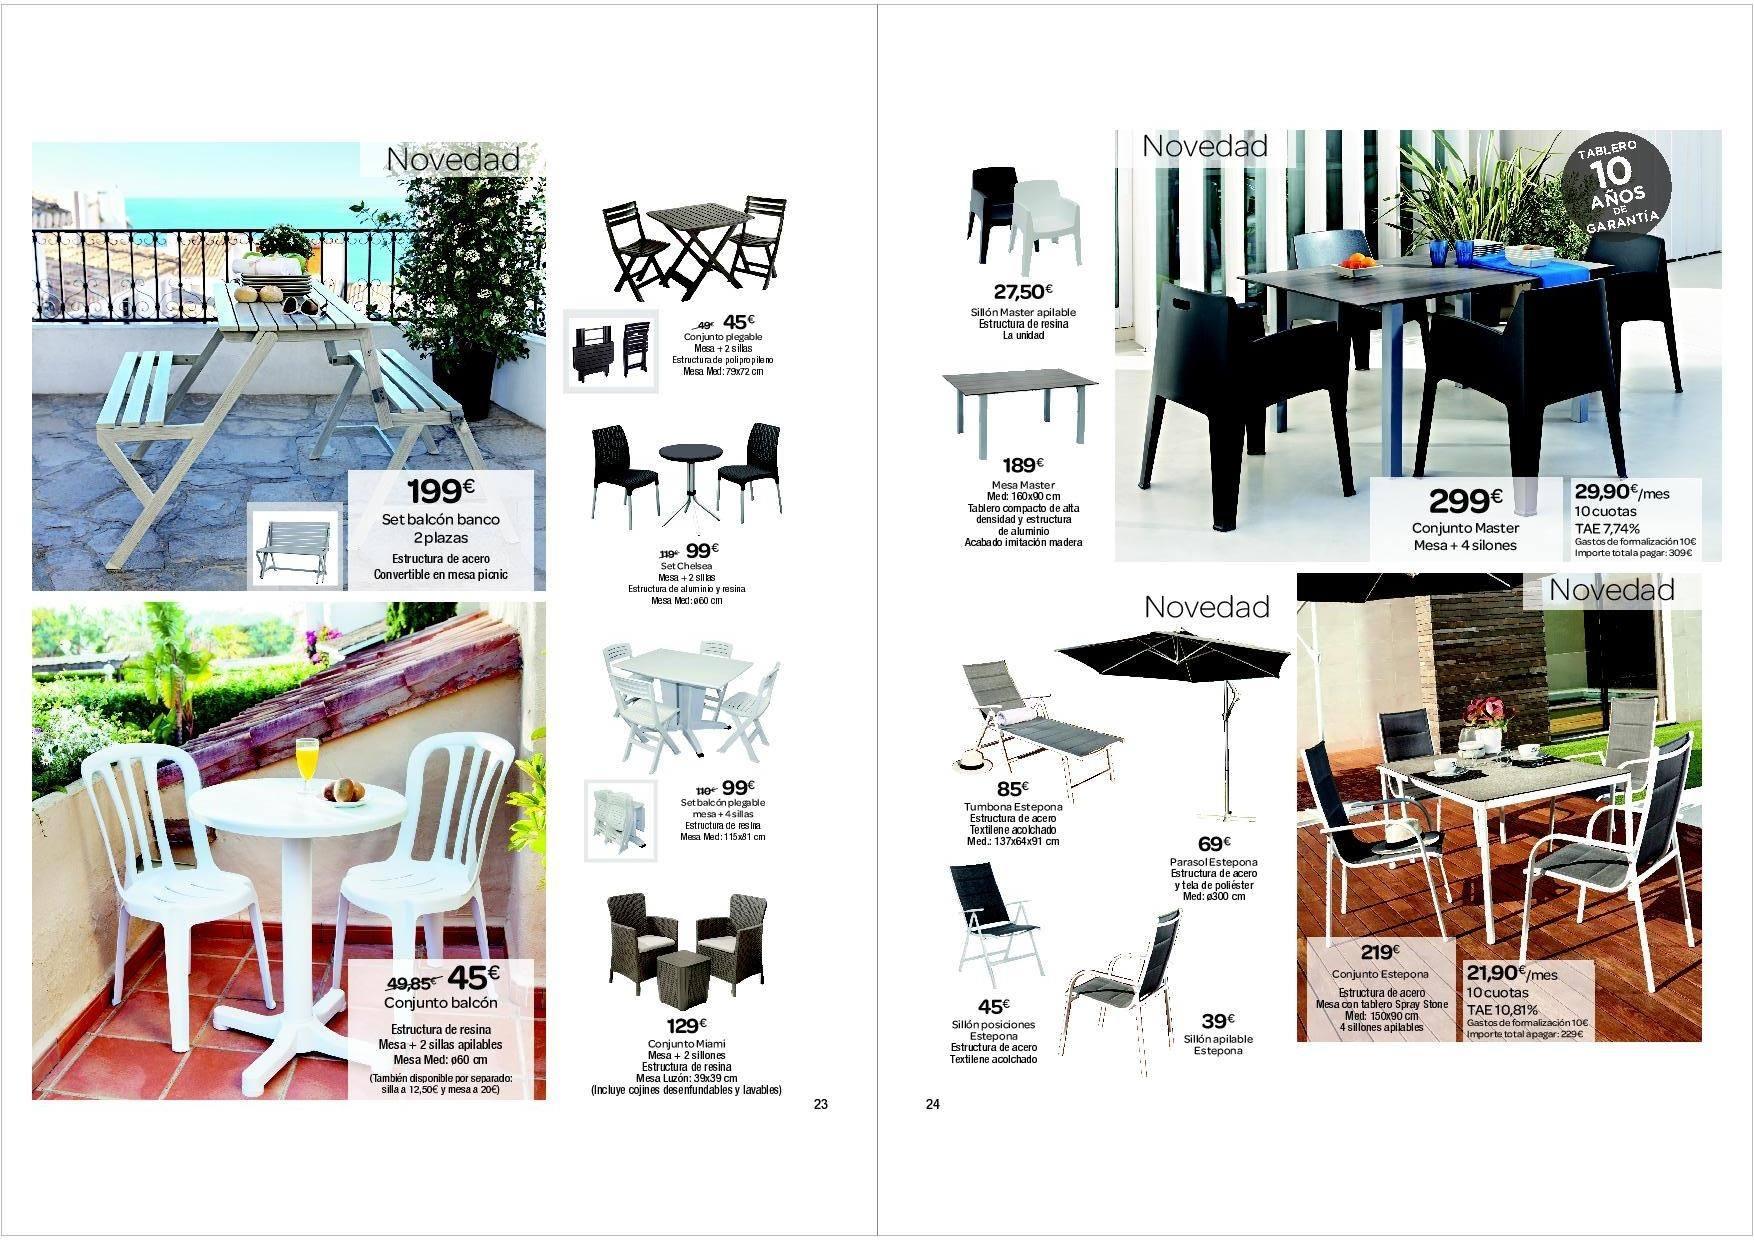 Catalogo carrefour jardin abril 2016 12 for Muebles jardin carrefour 2016